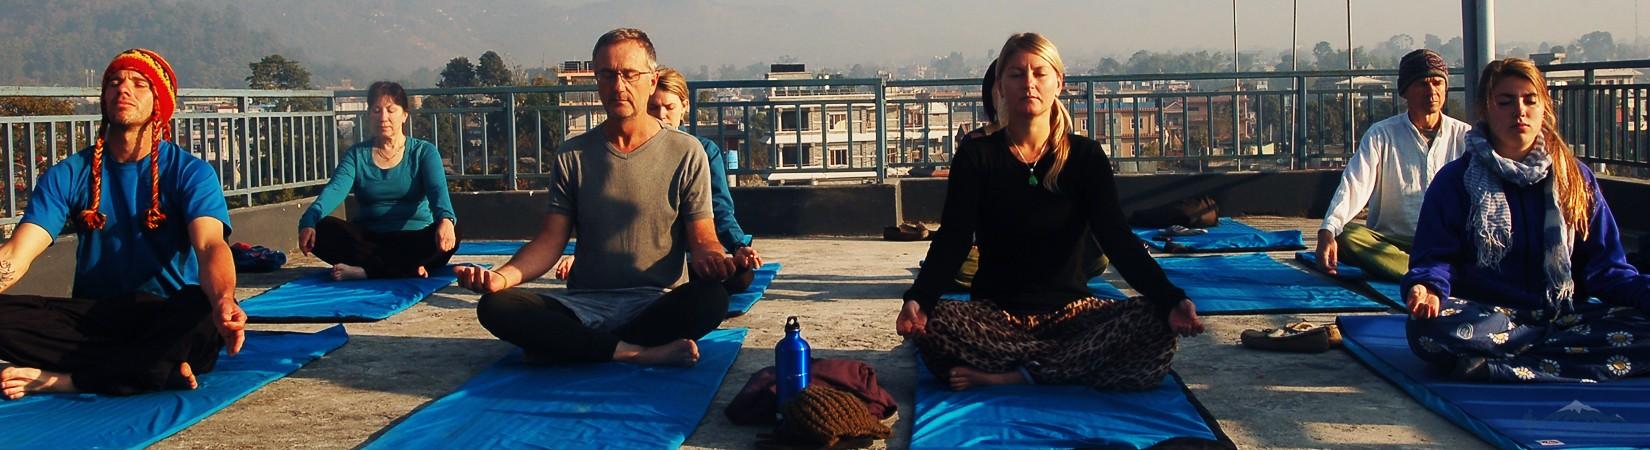 kathmandu yoga tour